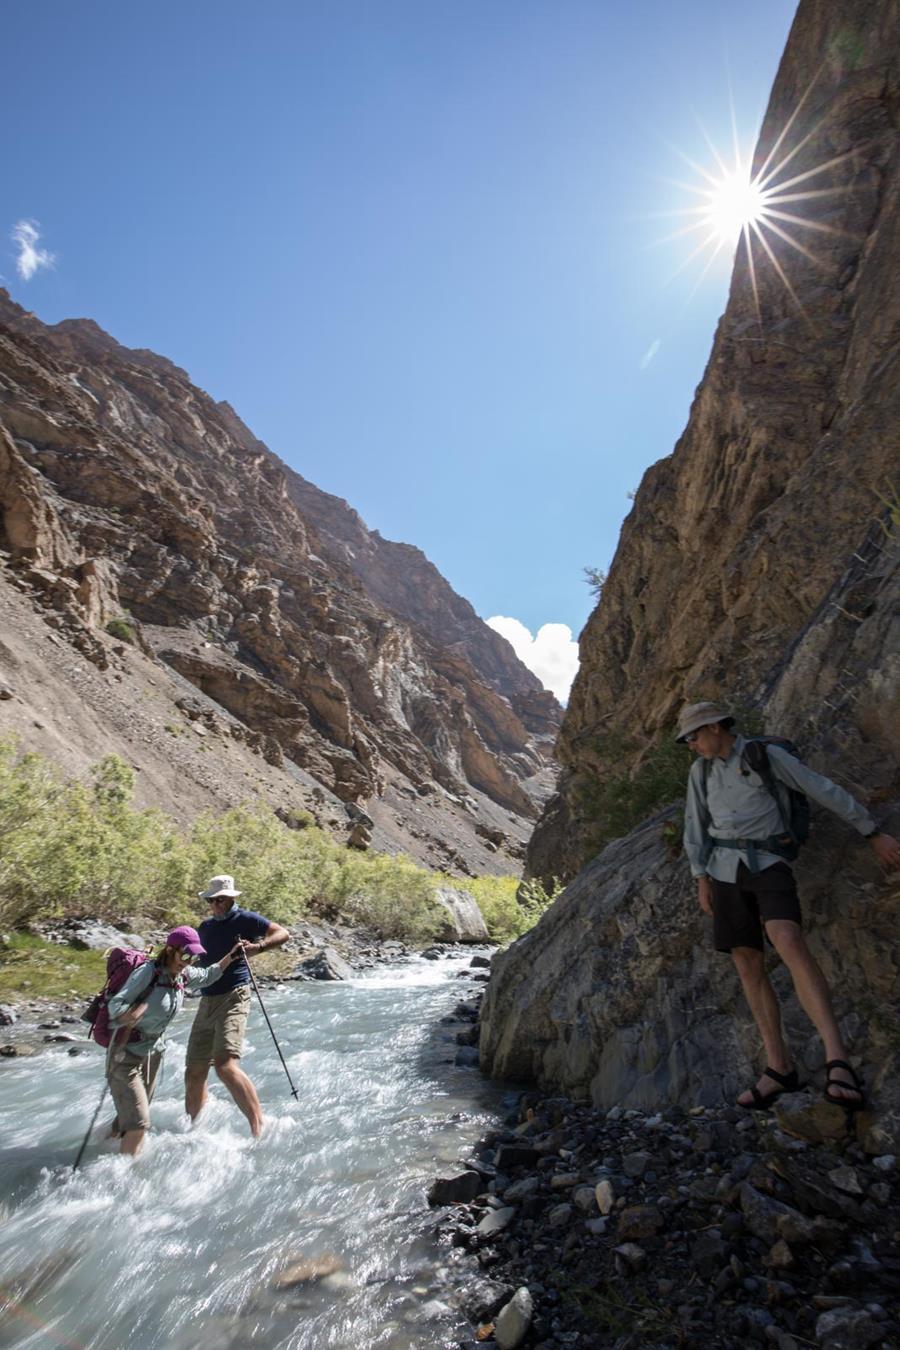 A Zanskar canyon crossing, Mike helping Karen across